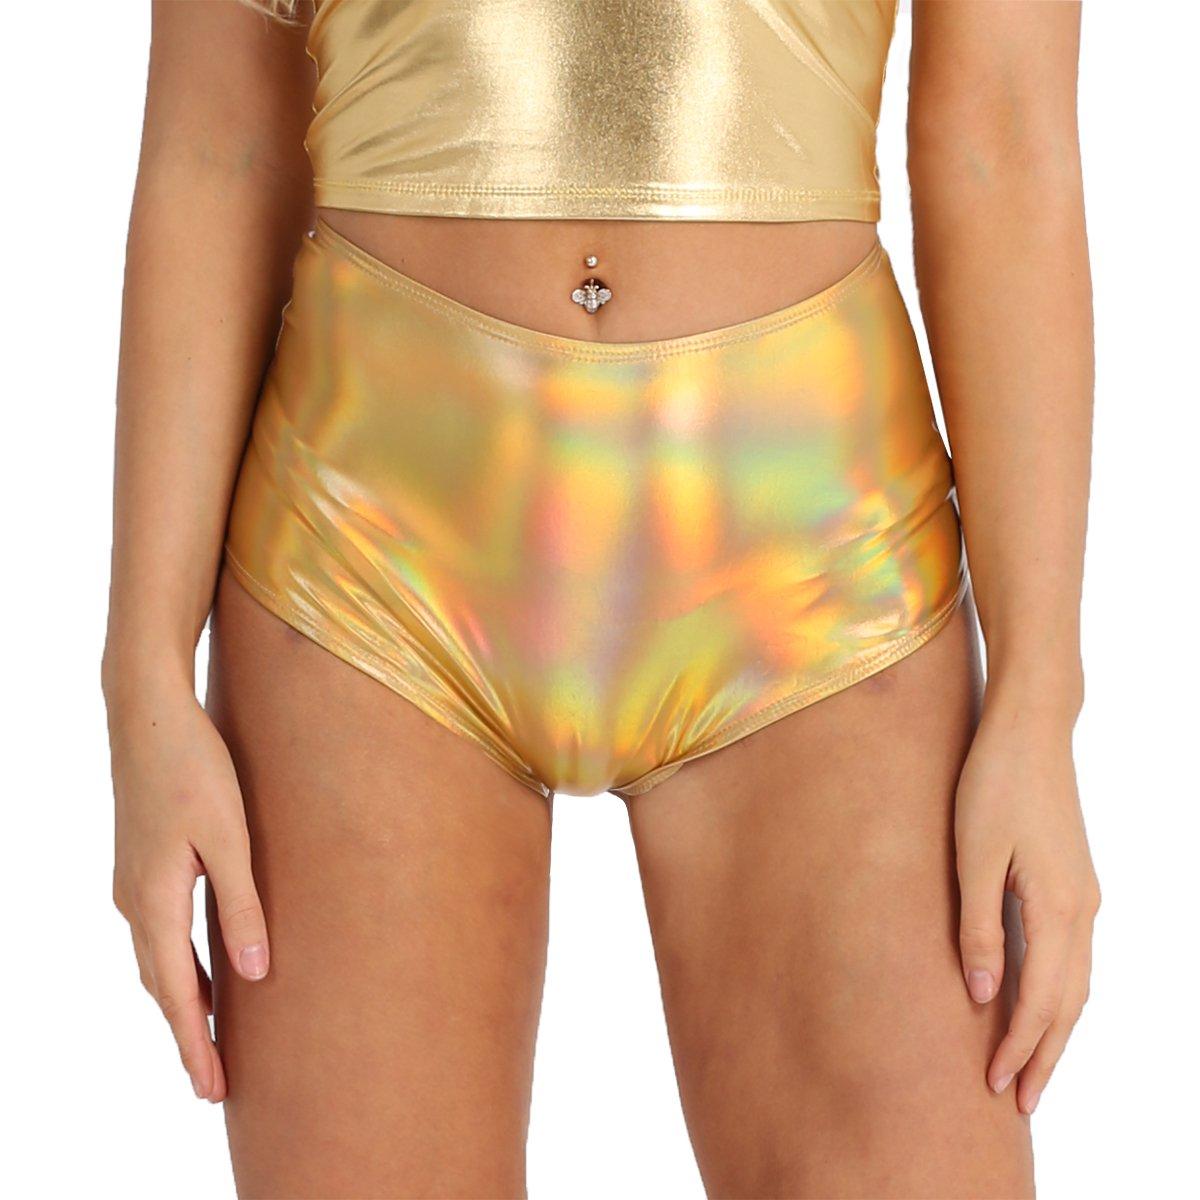 Alvivi Women Shiny Metallic Hologram High Waisted Booty Shorts Rave Dance Bottoms Panties